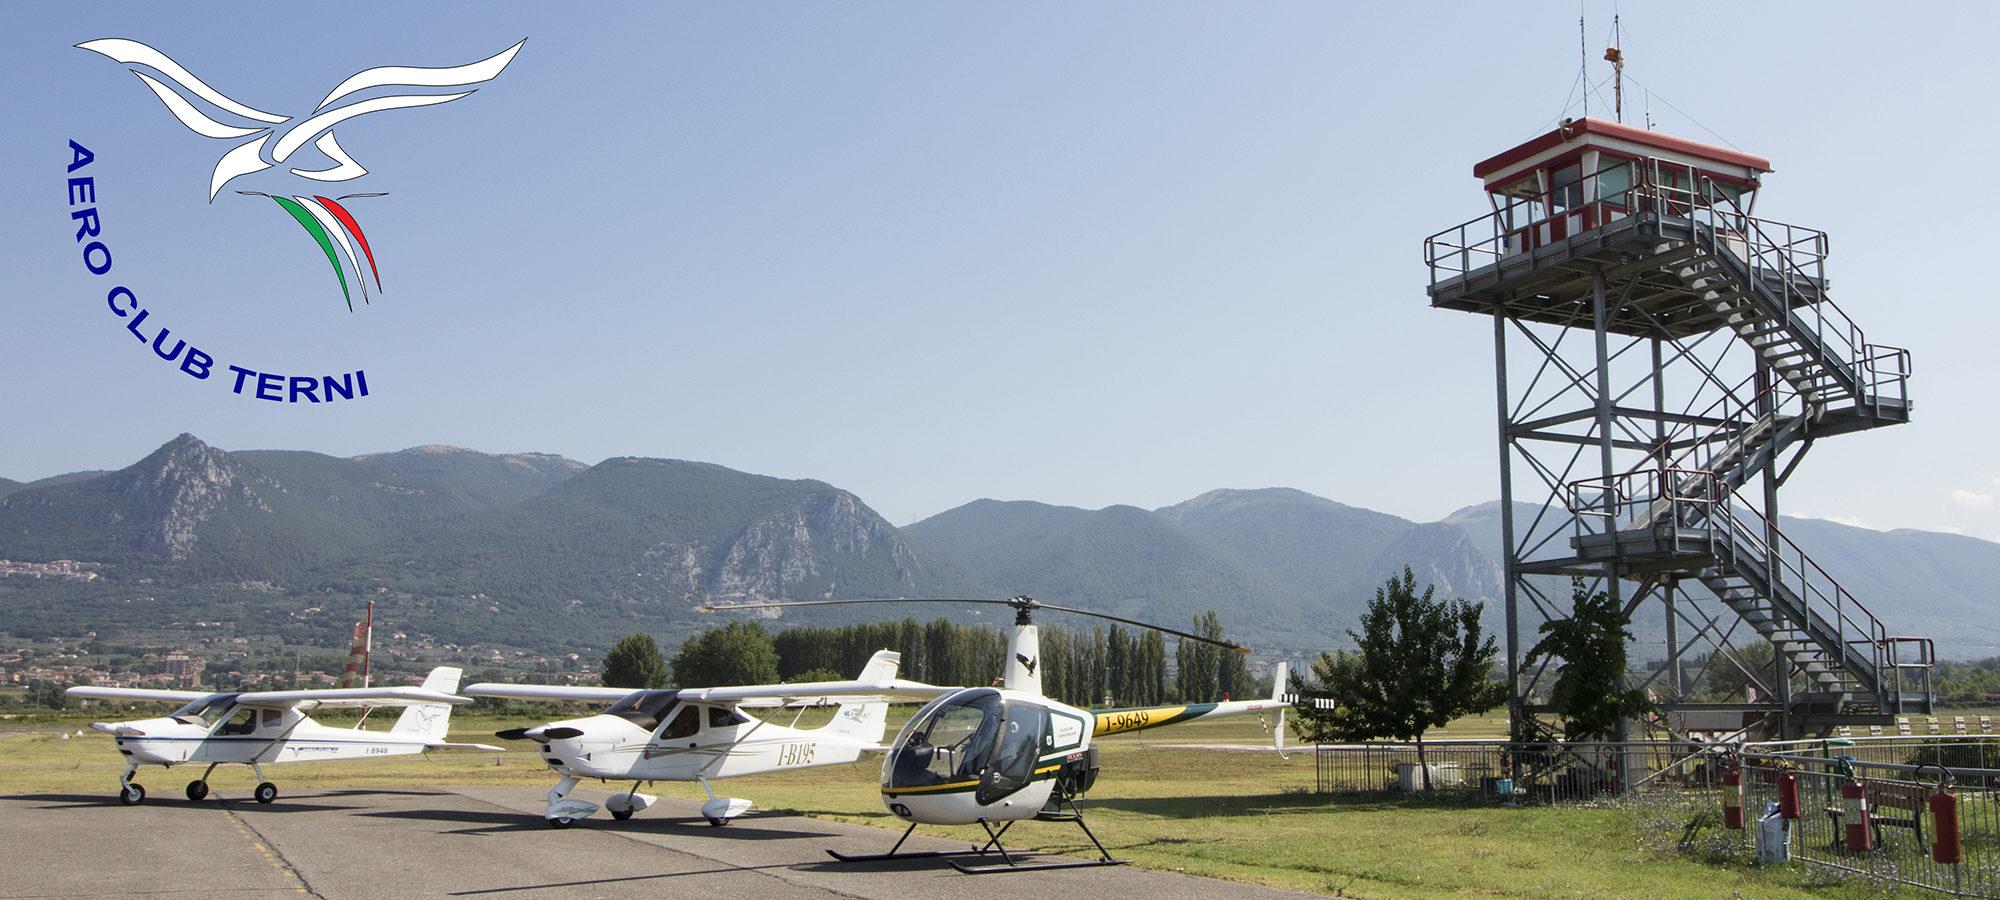 Aero Club Terni